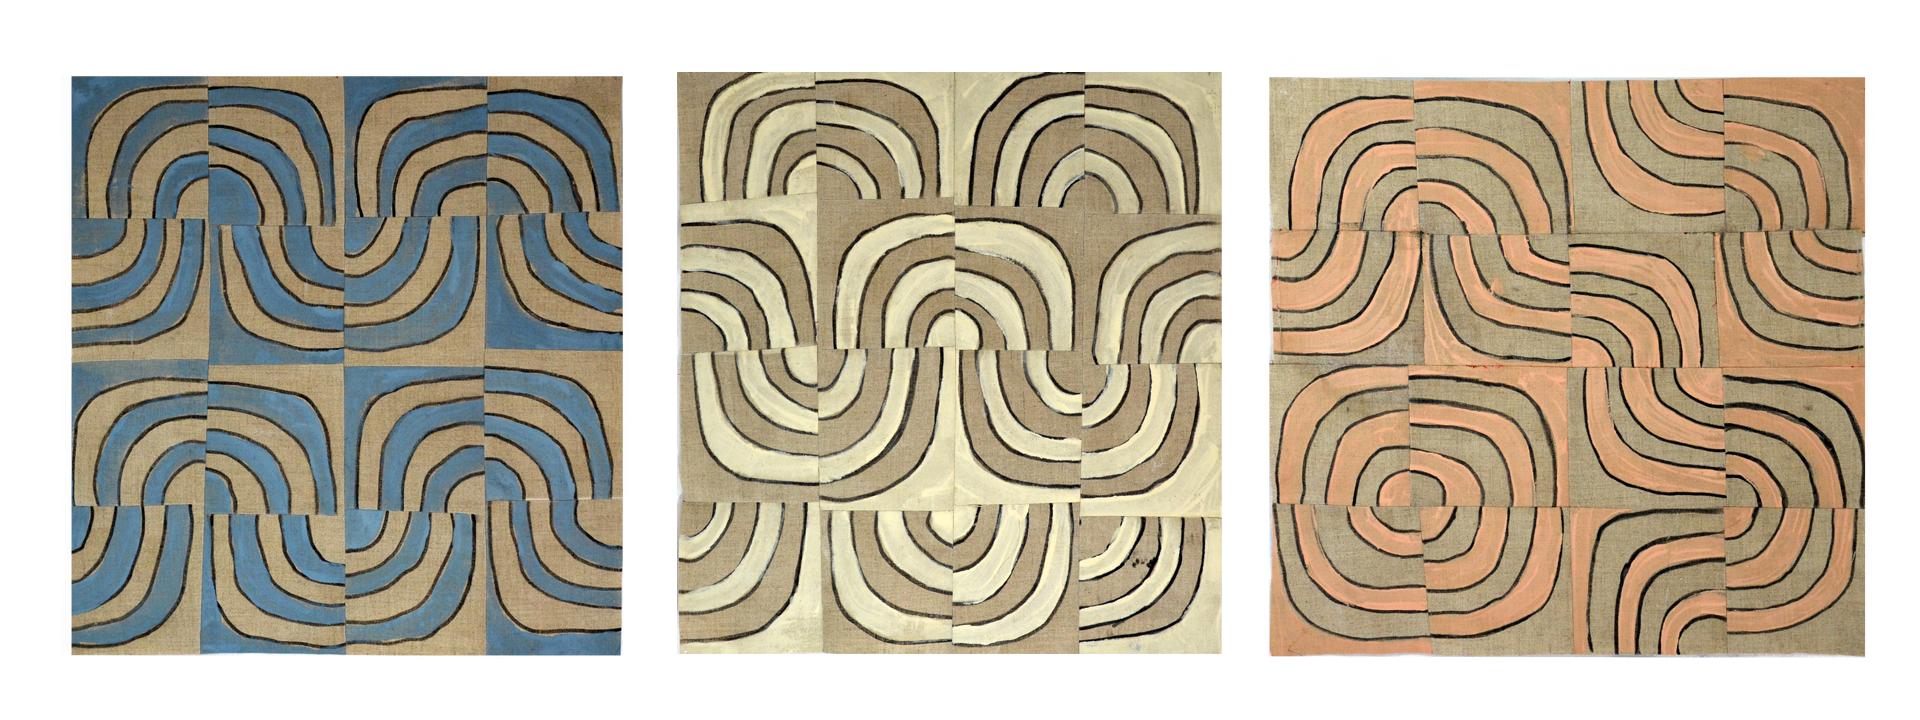 "Willis, ""Quarter Turns"", Primed Raw Linen, Acrylic, 16""x 48"", 2016"